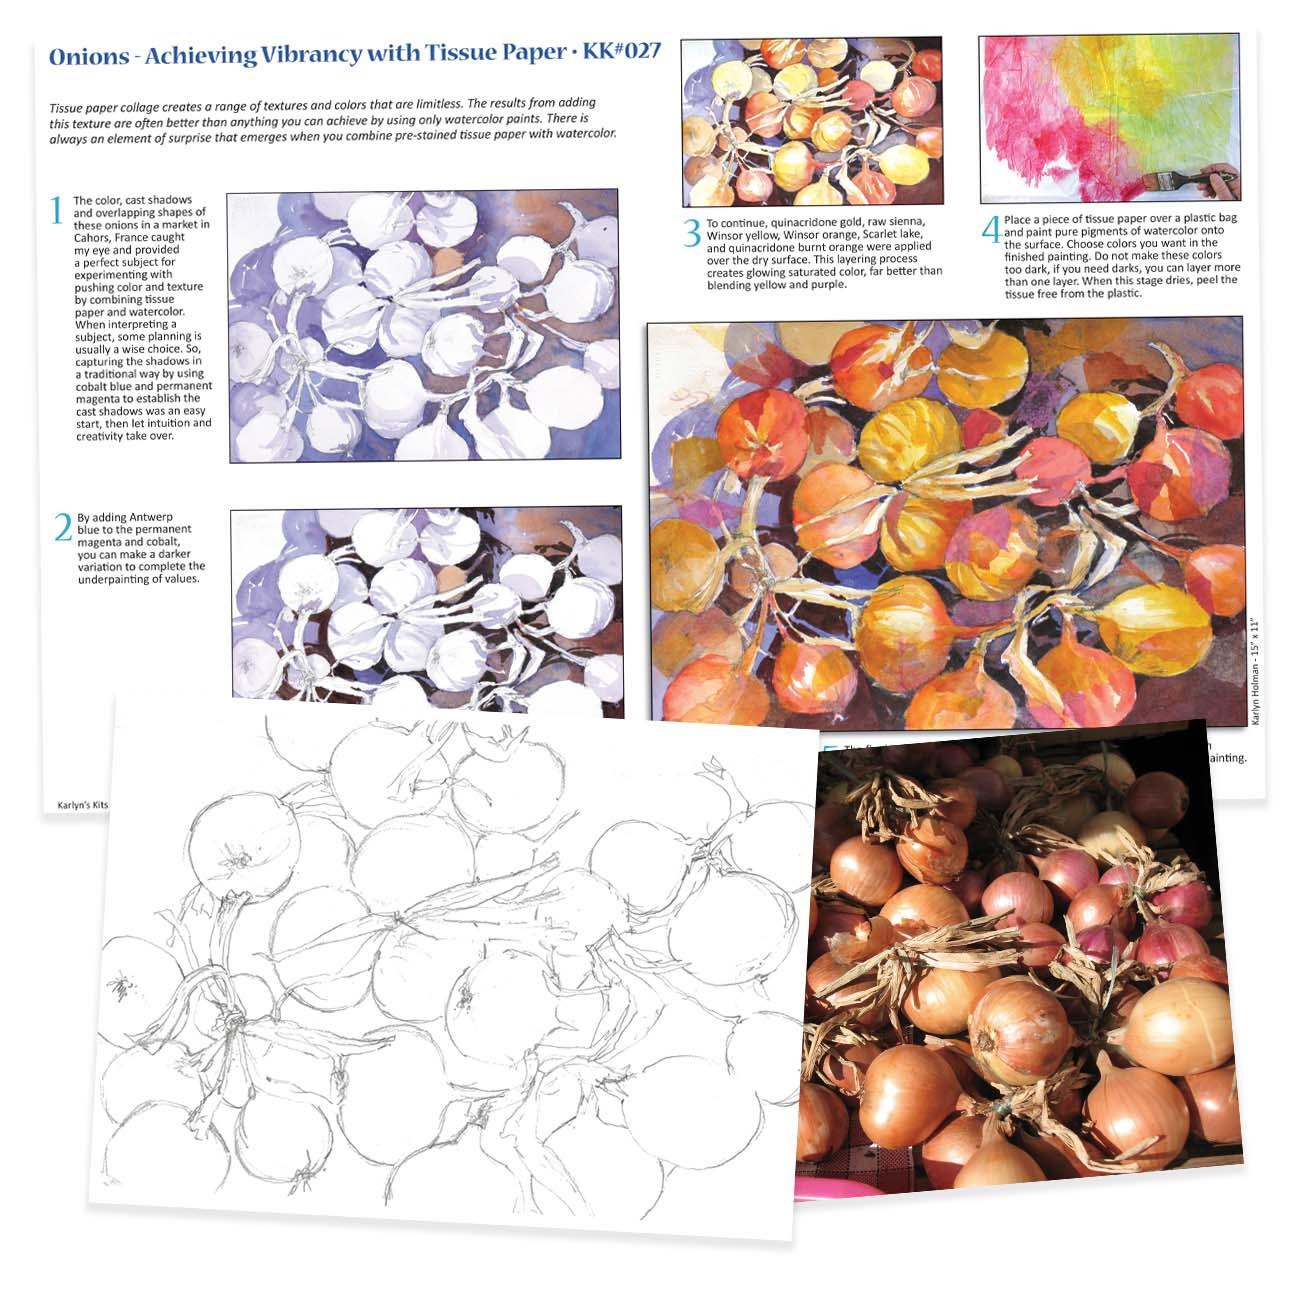 KK027 Onions - Vibrancy with Tissue Paper